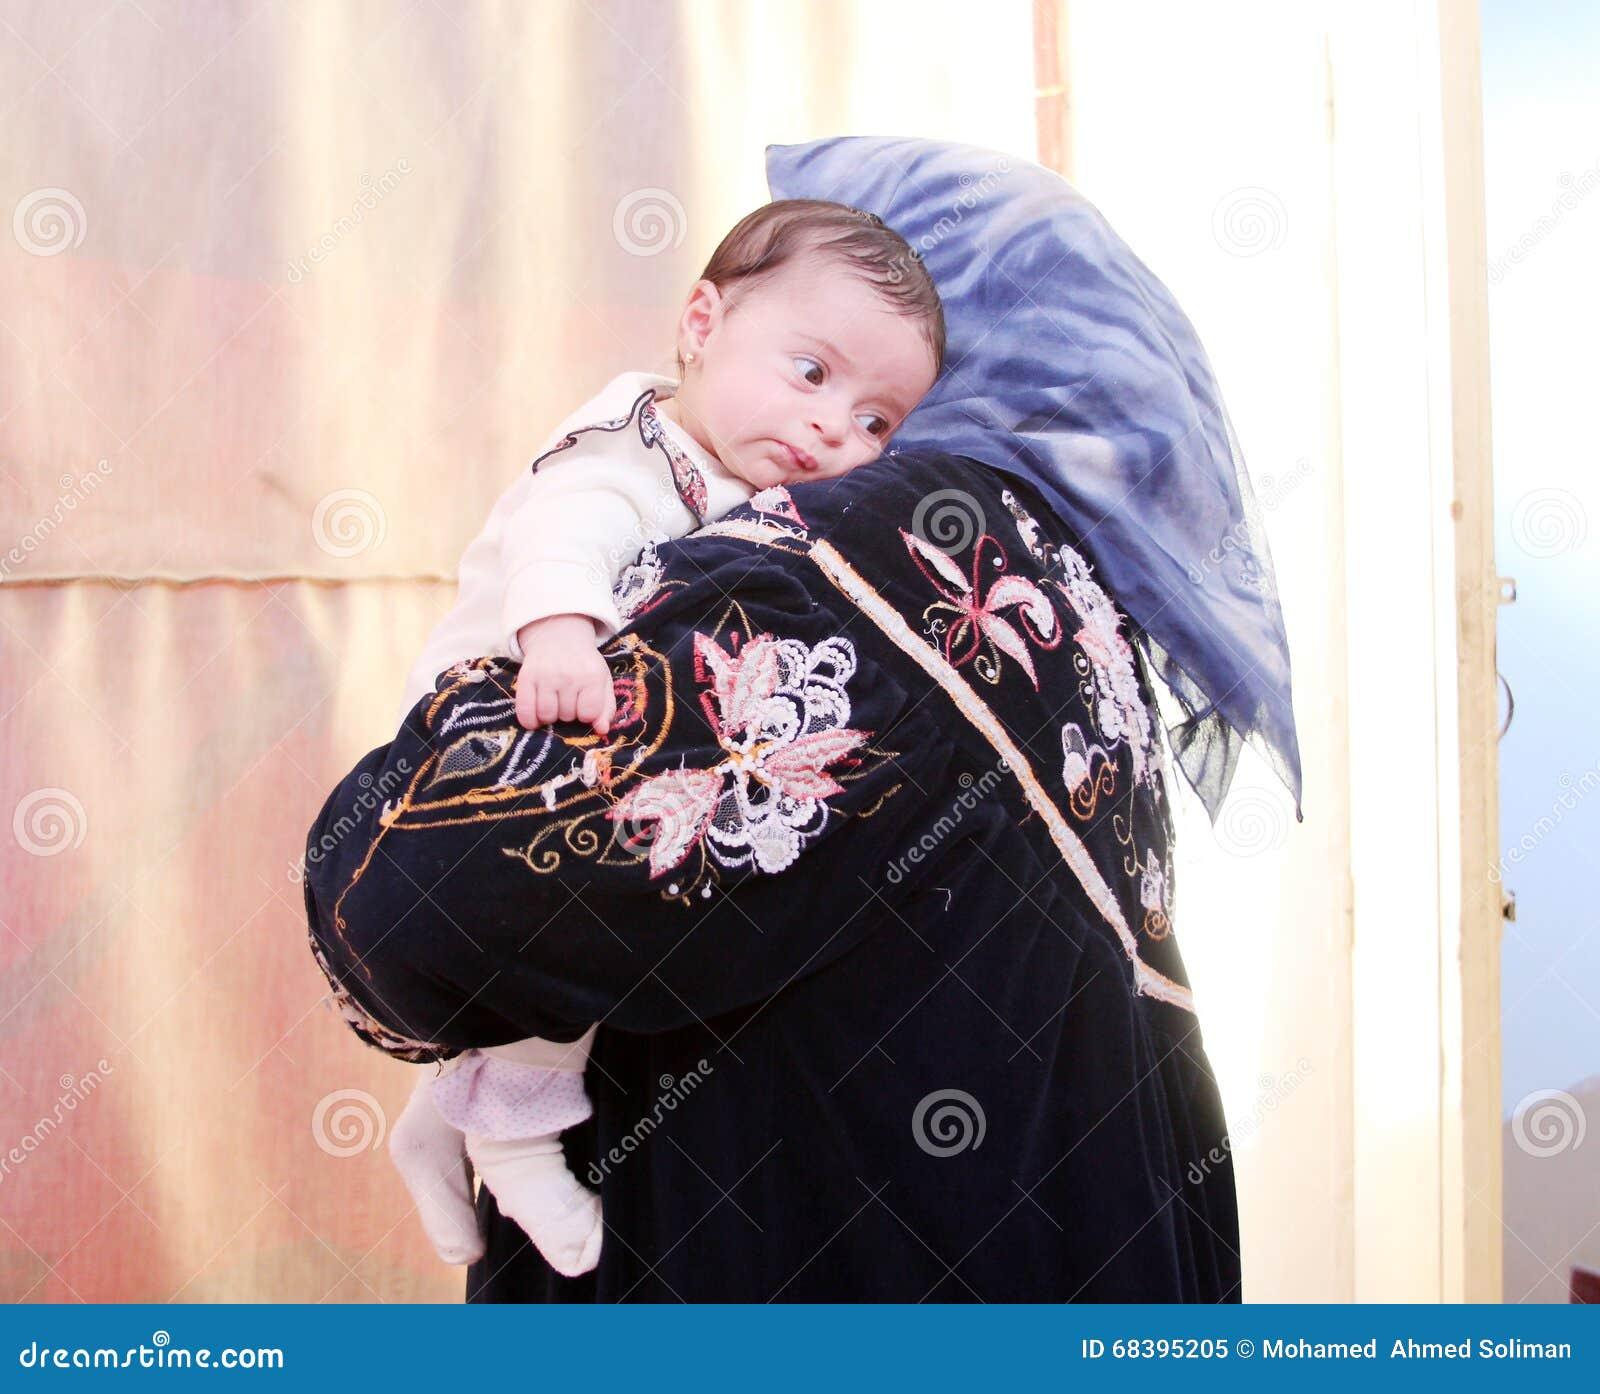 Arab egyptian newborn baby girl with grandmother